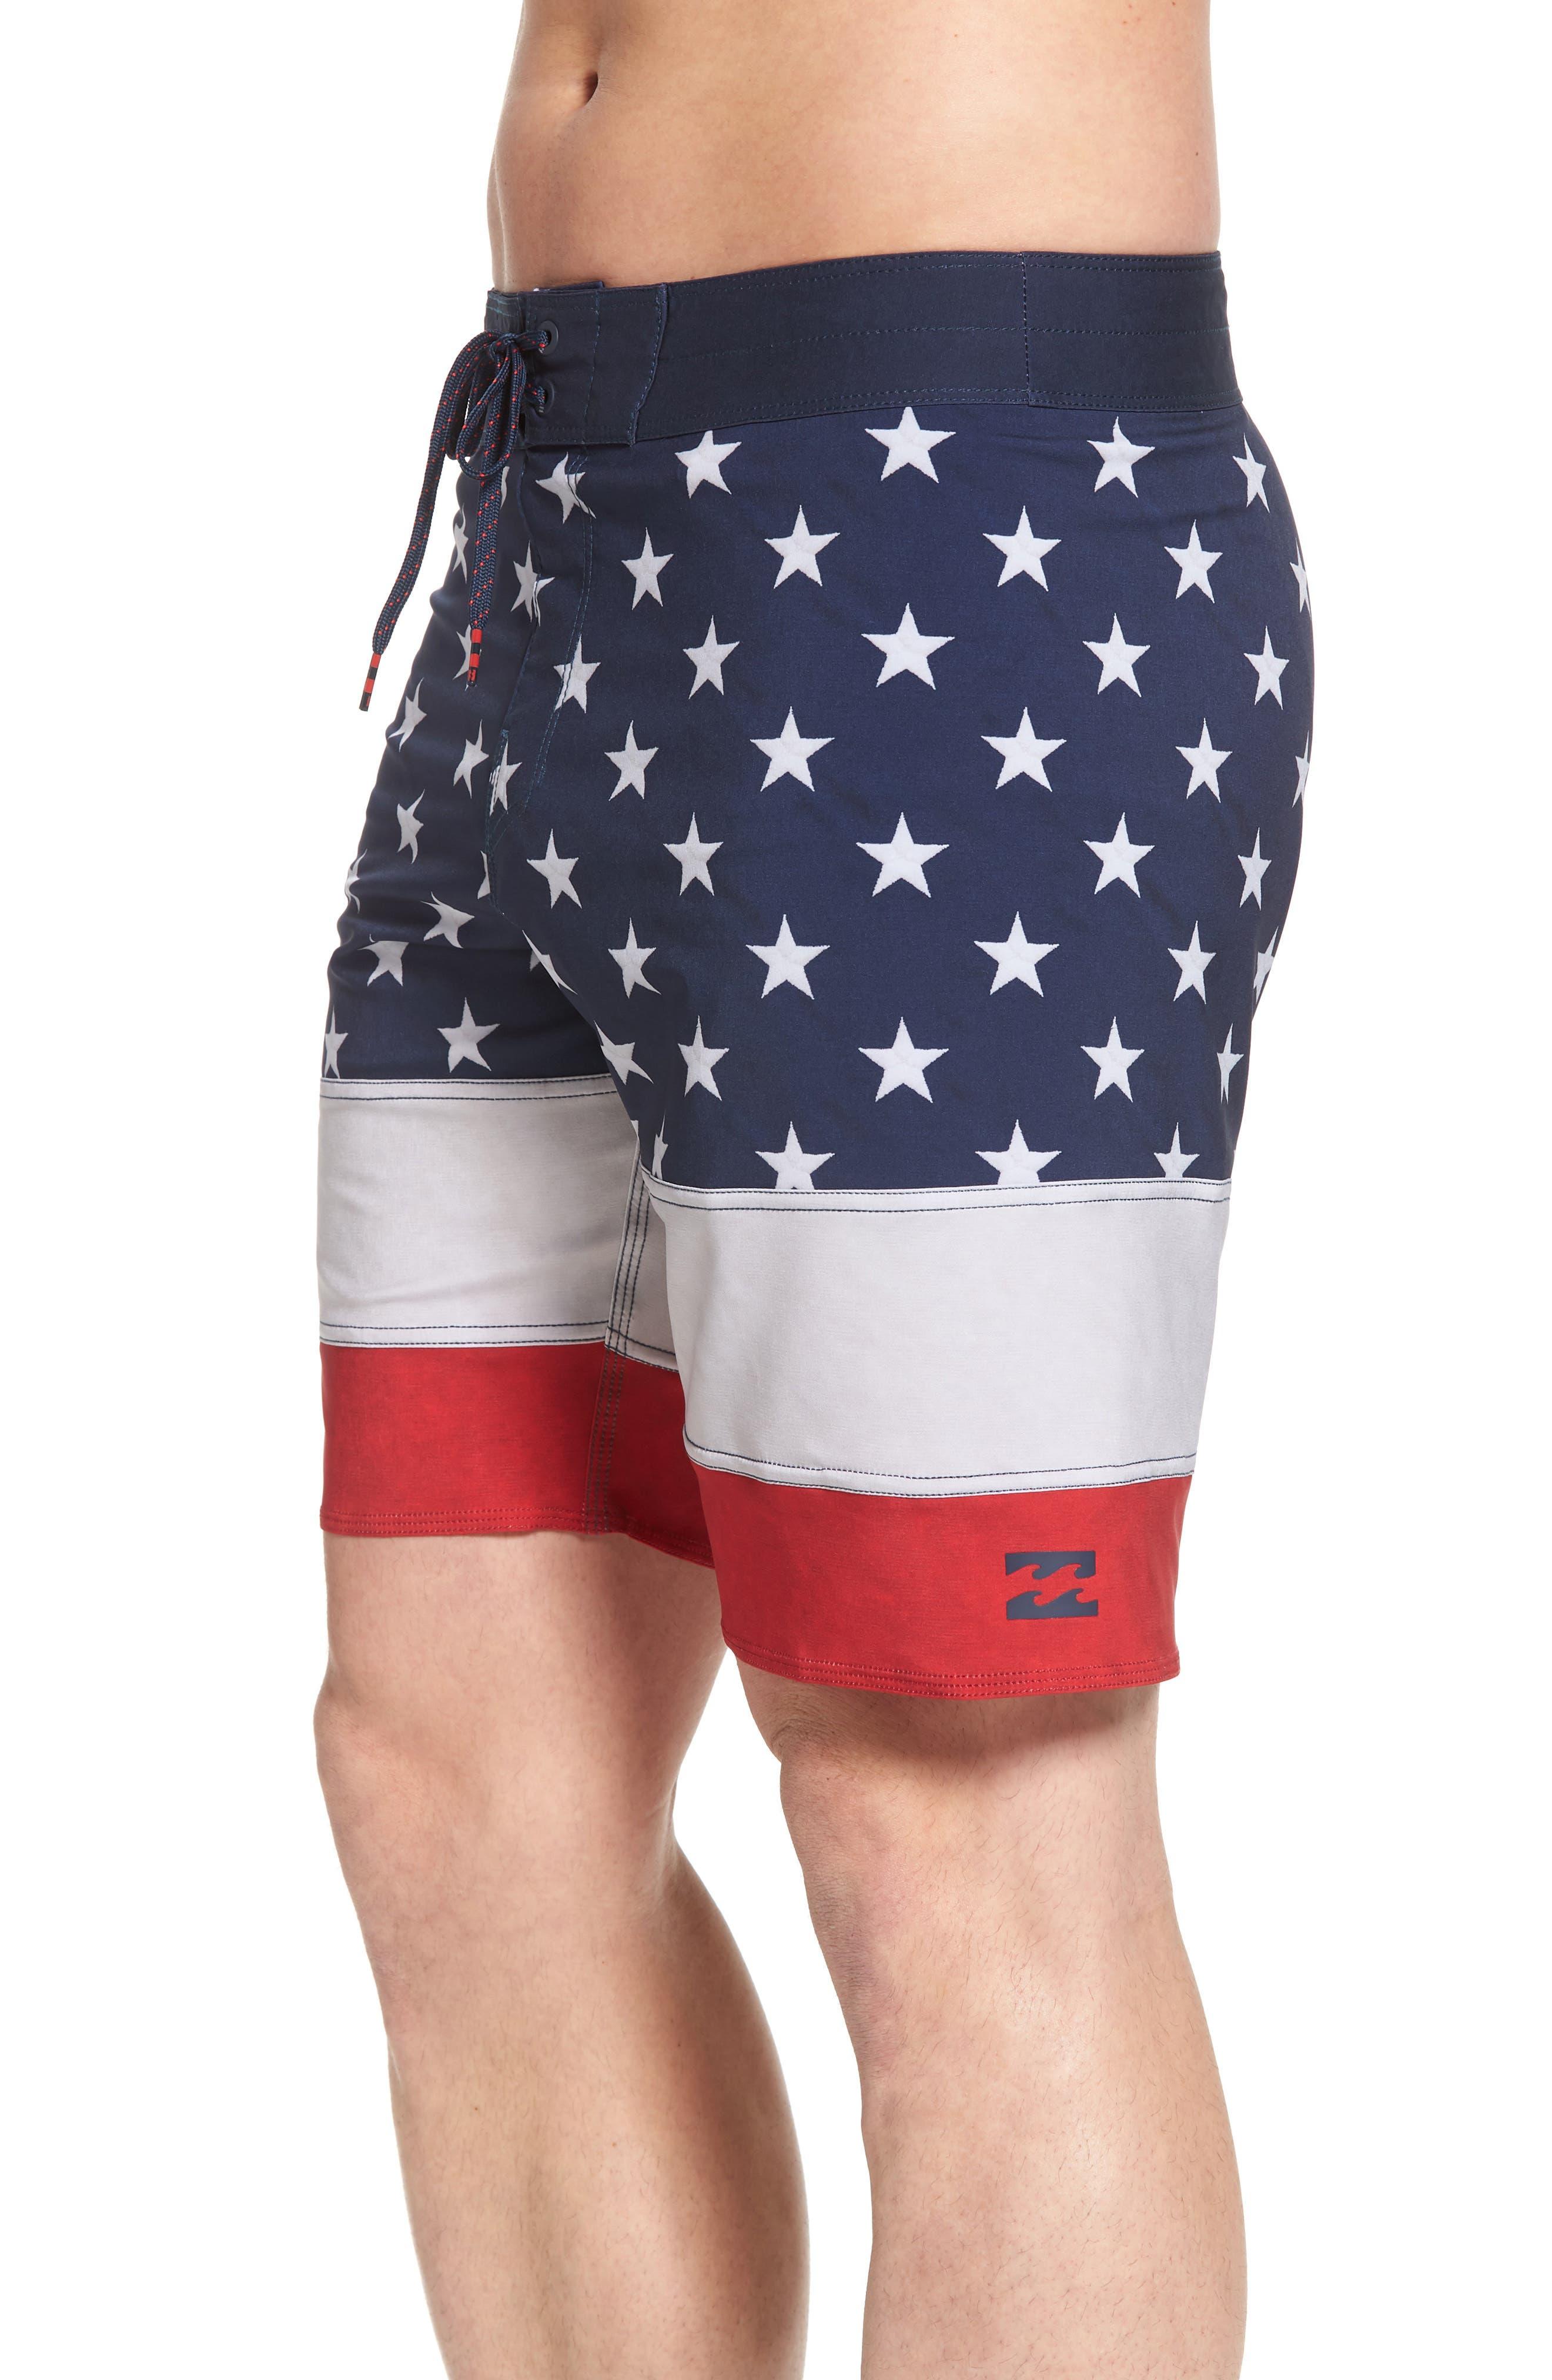 Pump X Board Shorts,                             Alternate thumbnail 4, color,                             400